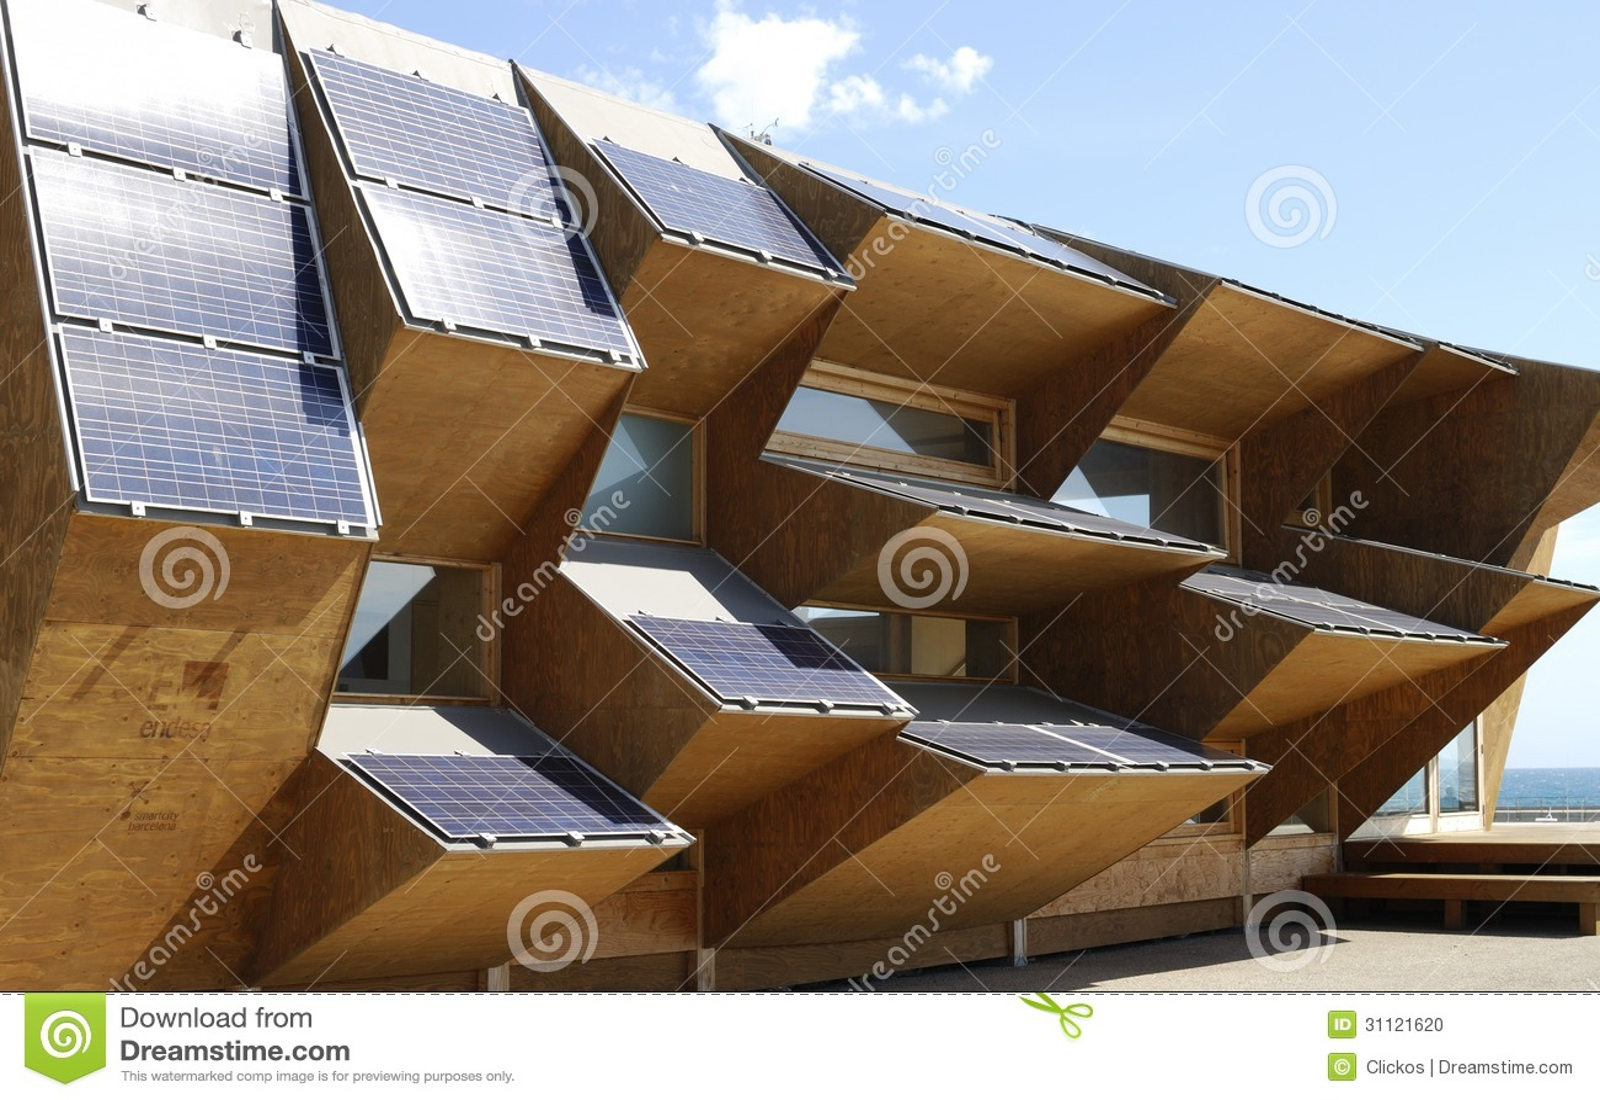 Solar power display building at barcelona beach spain editorial image image 31121620 - Solar barcelona ...